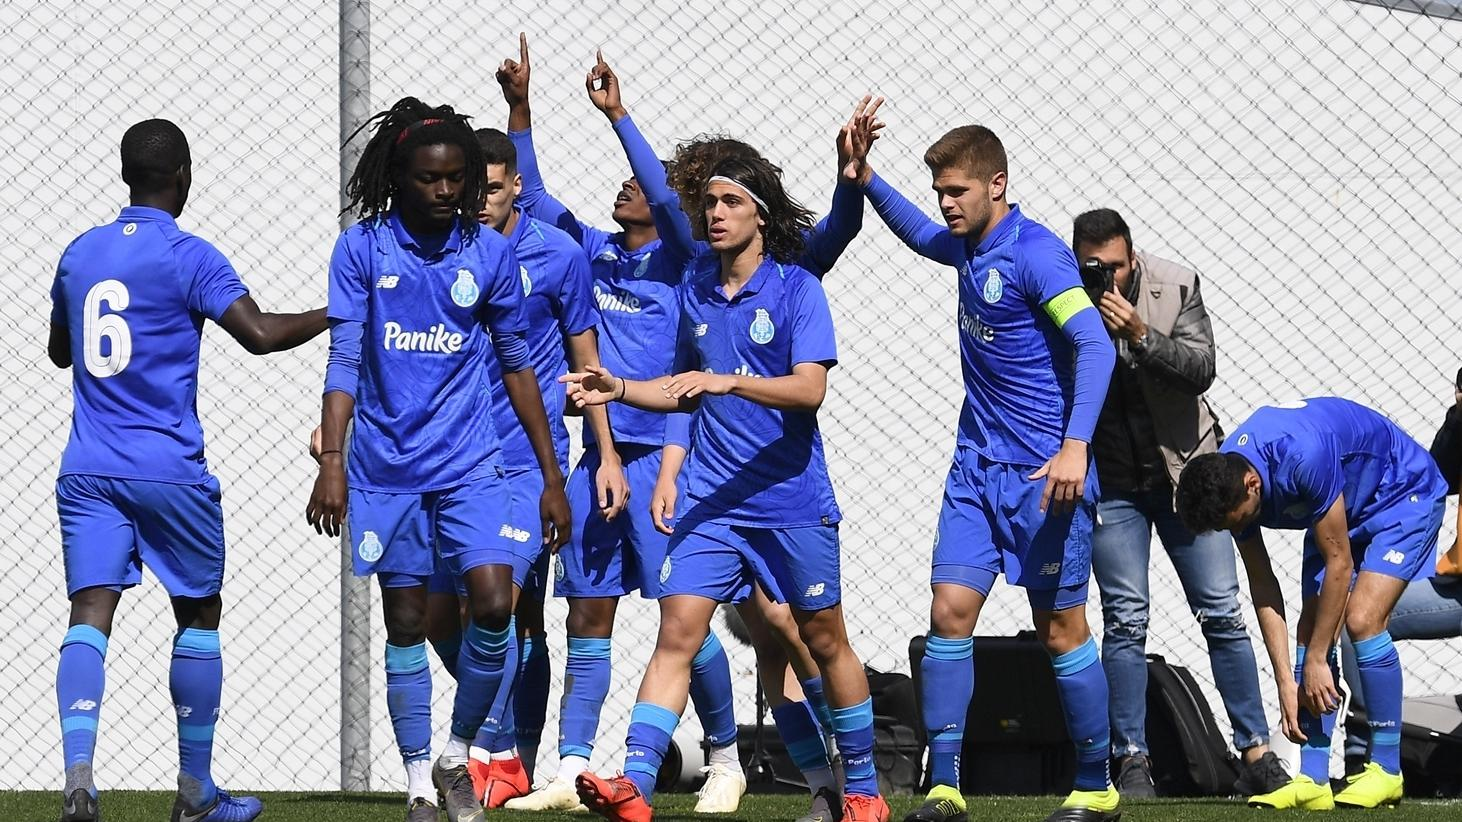 Youth League round of 16 report - UEFA Youth League - News - UEFA com